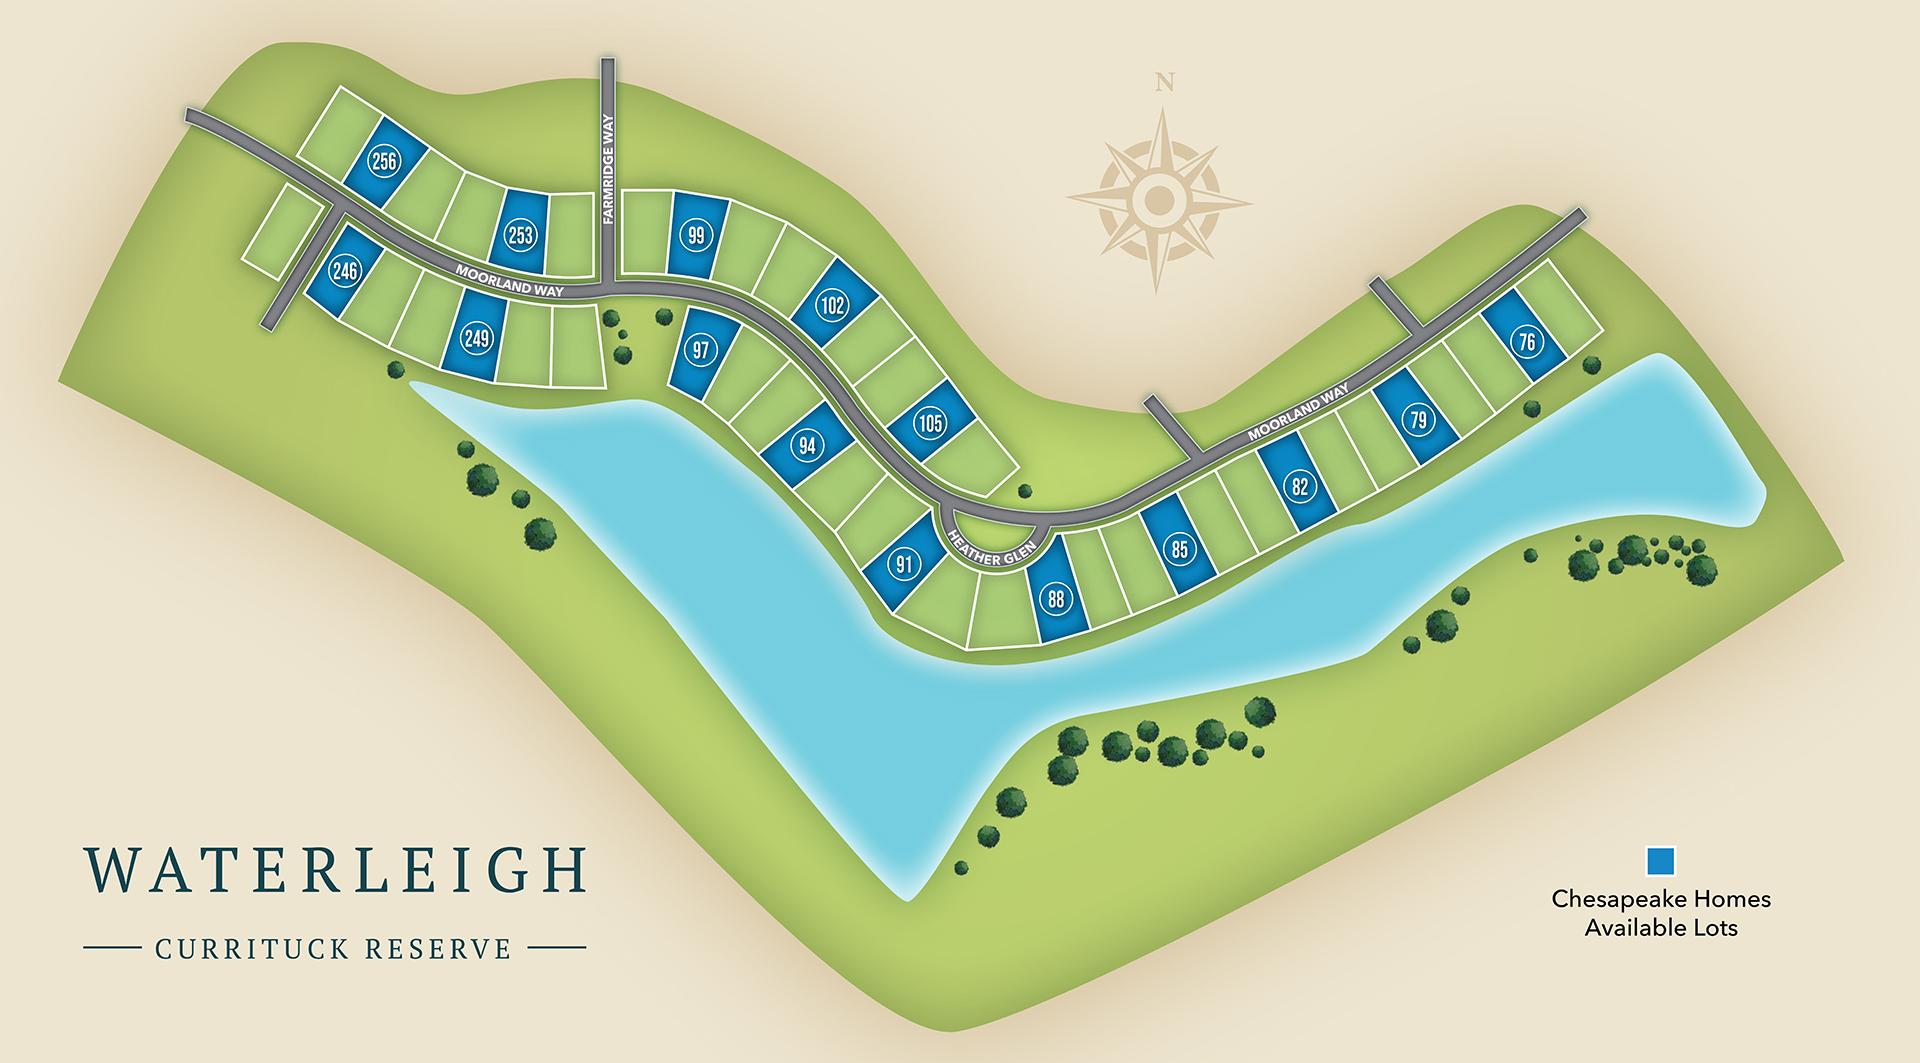 Moyock, NC Waterleigh New Homes from Chesapeake